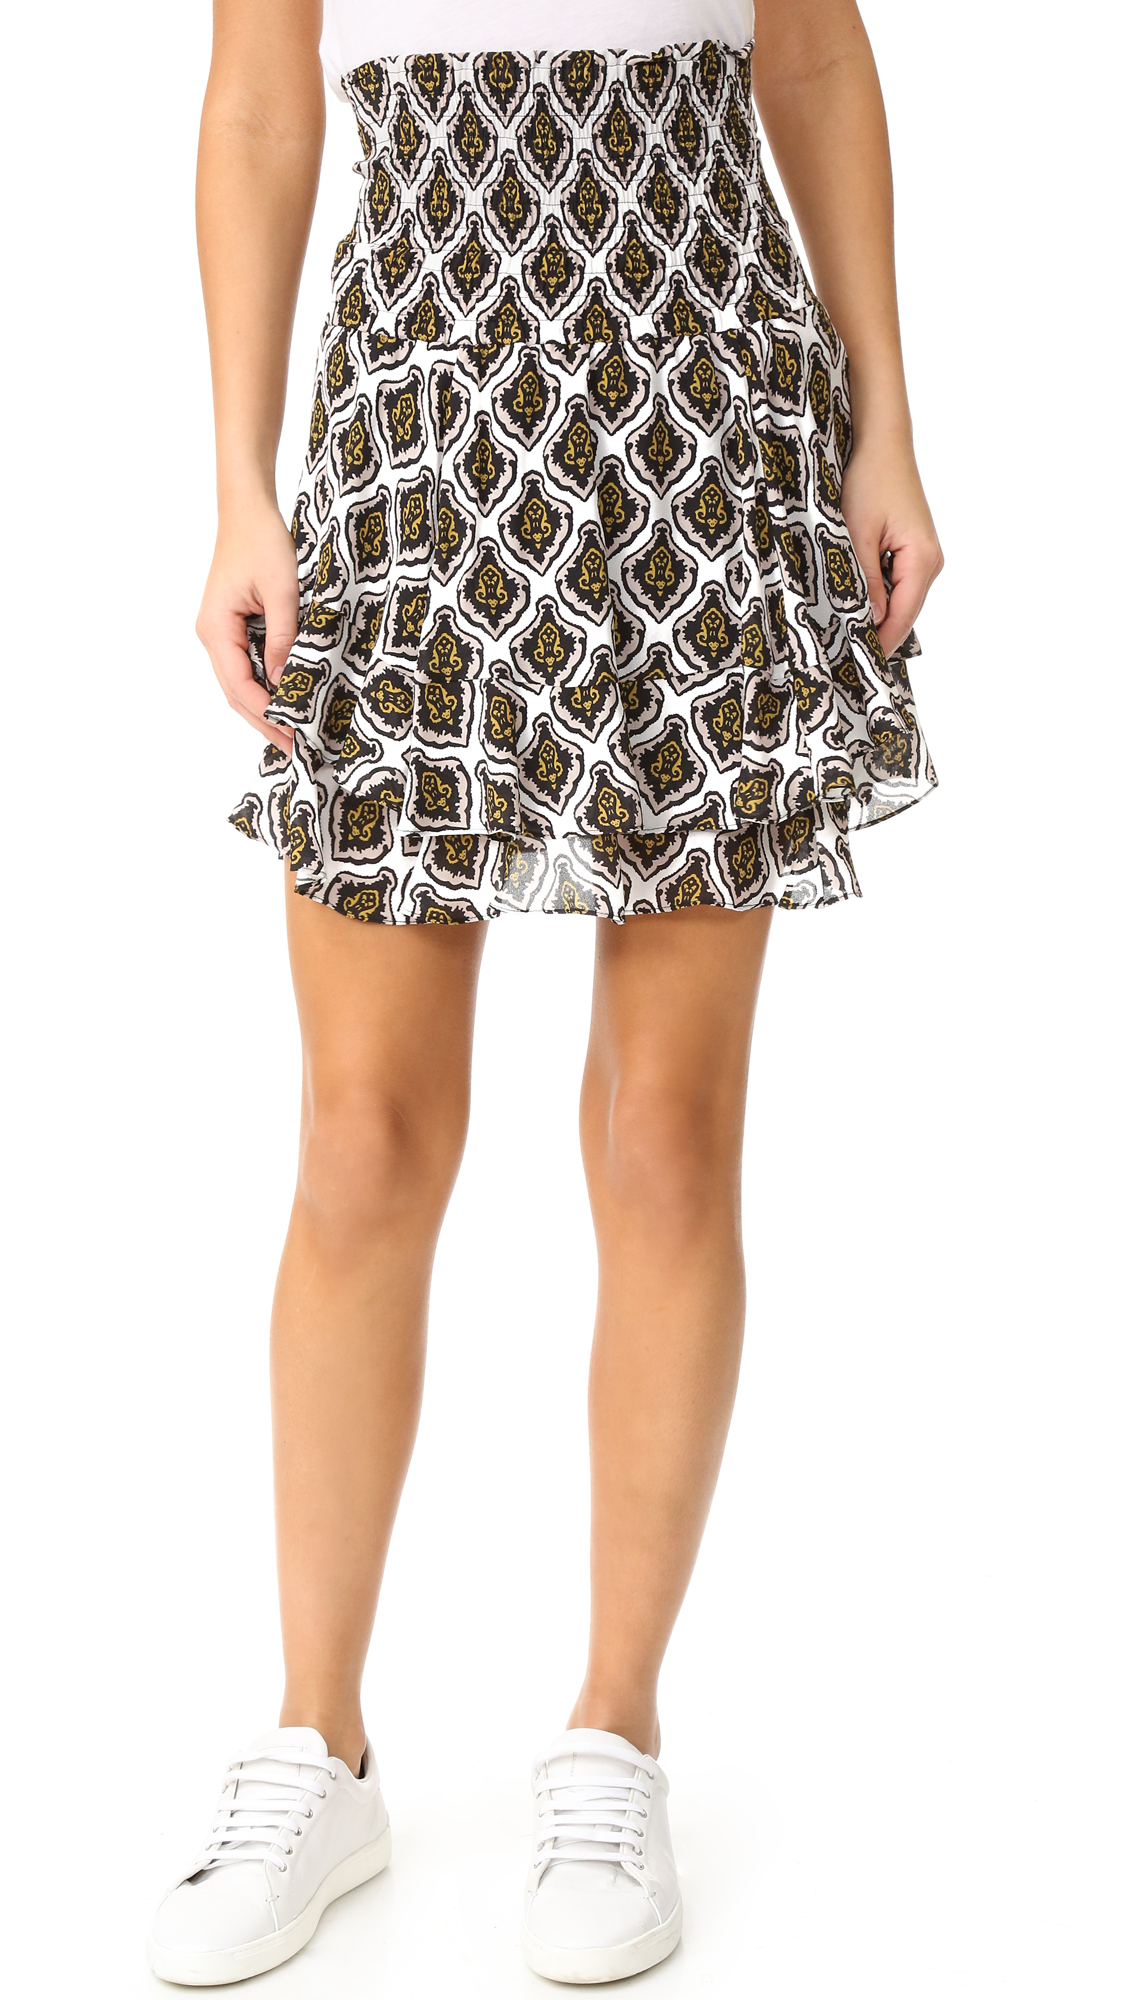 A.L.C. Vera Skirt - Black/White at Shopbop